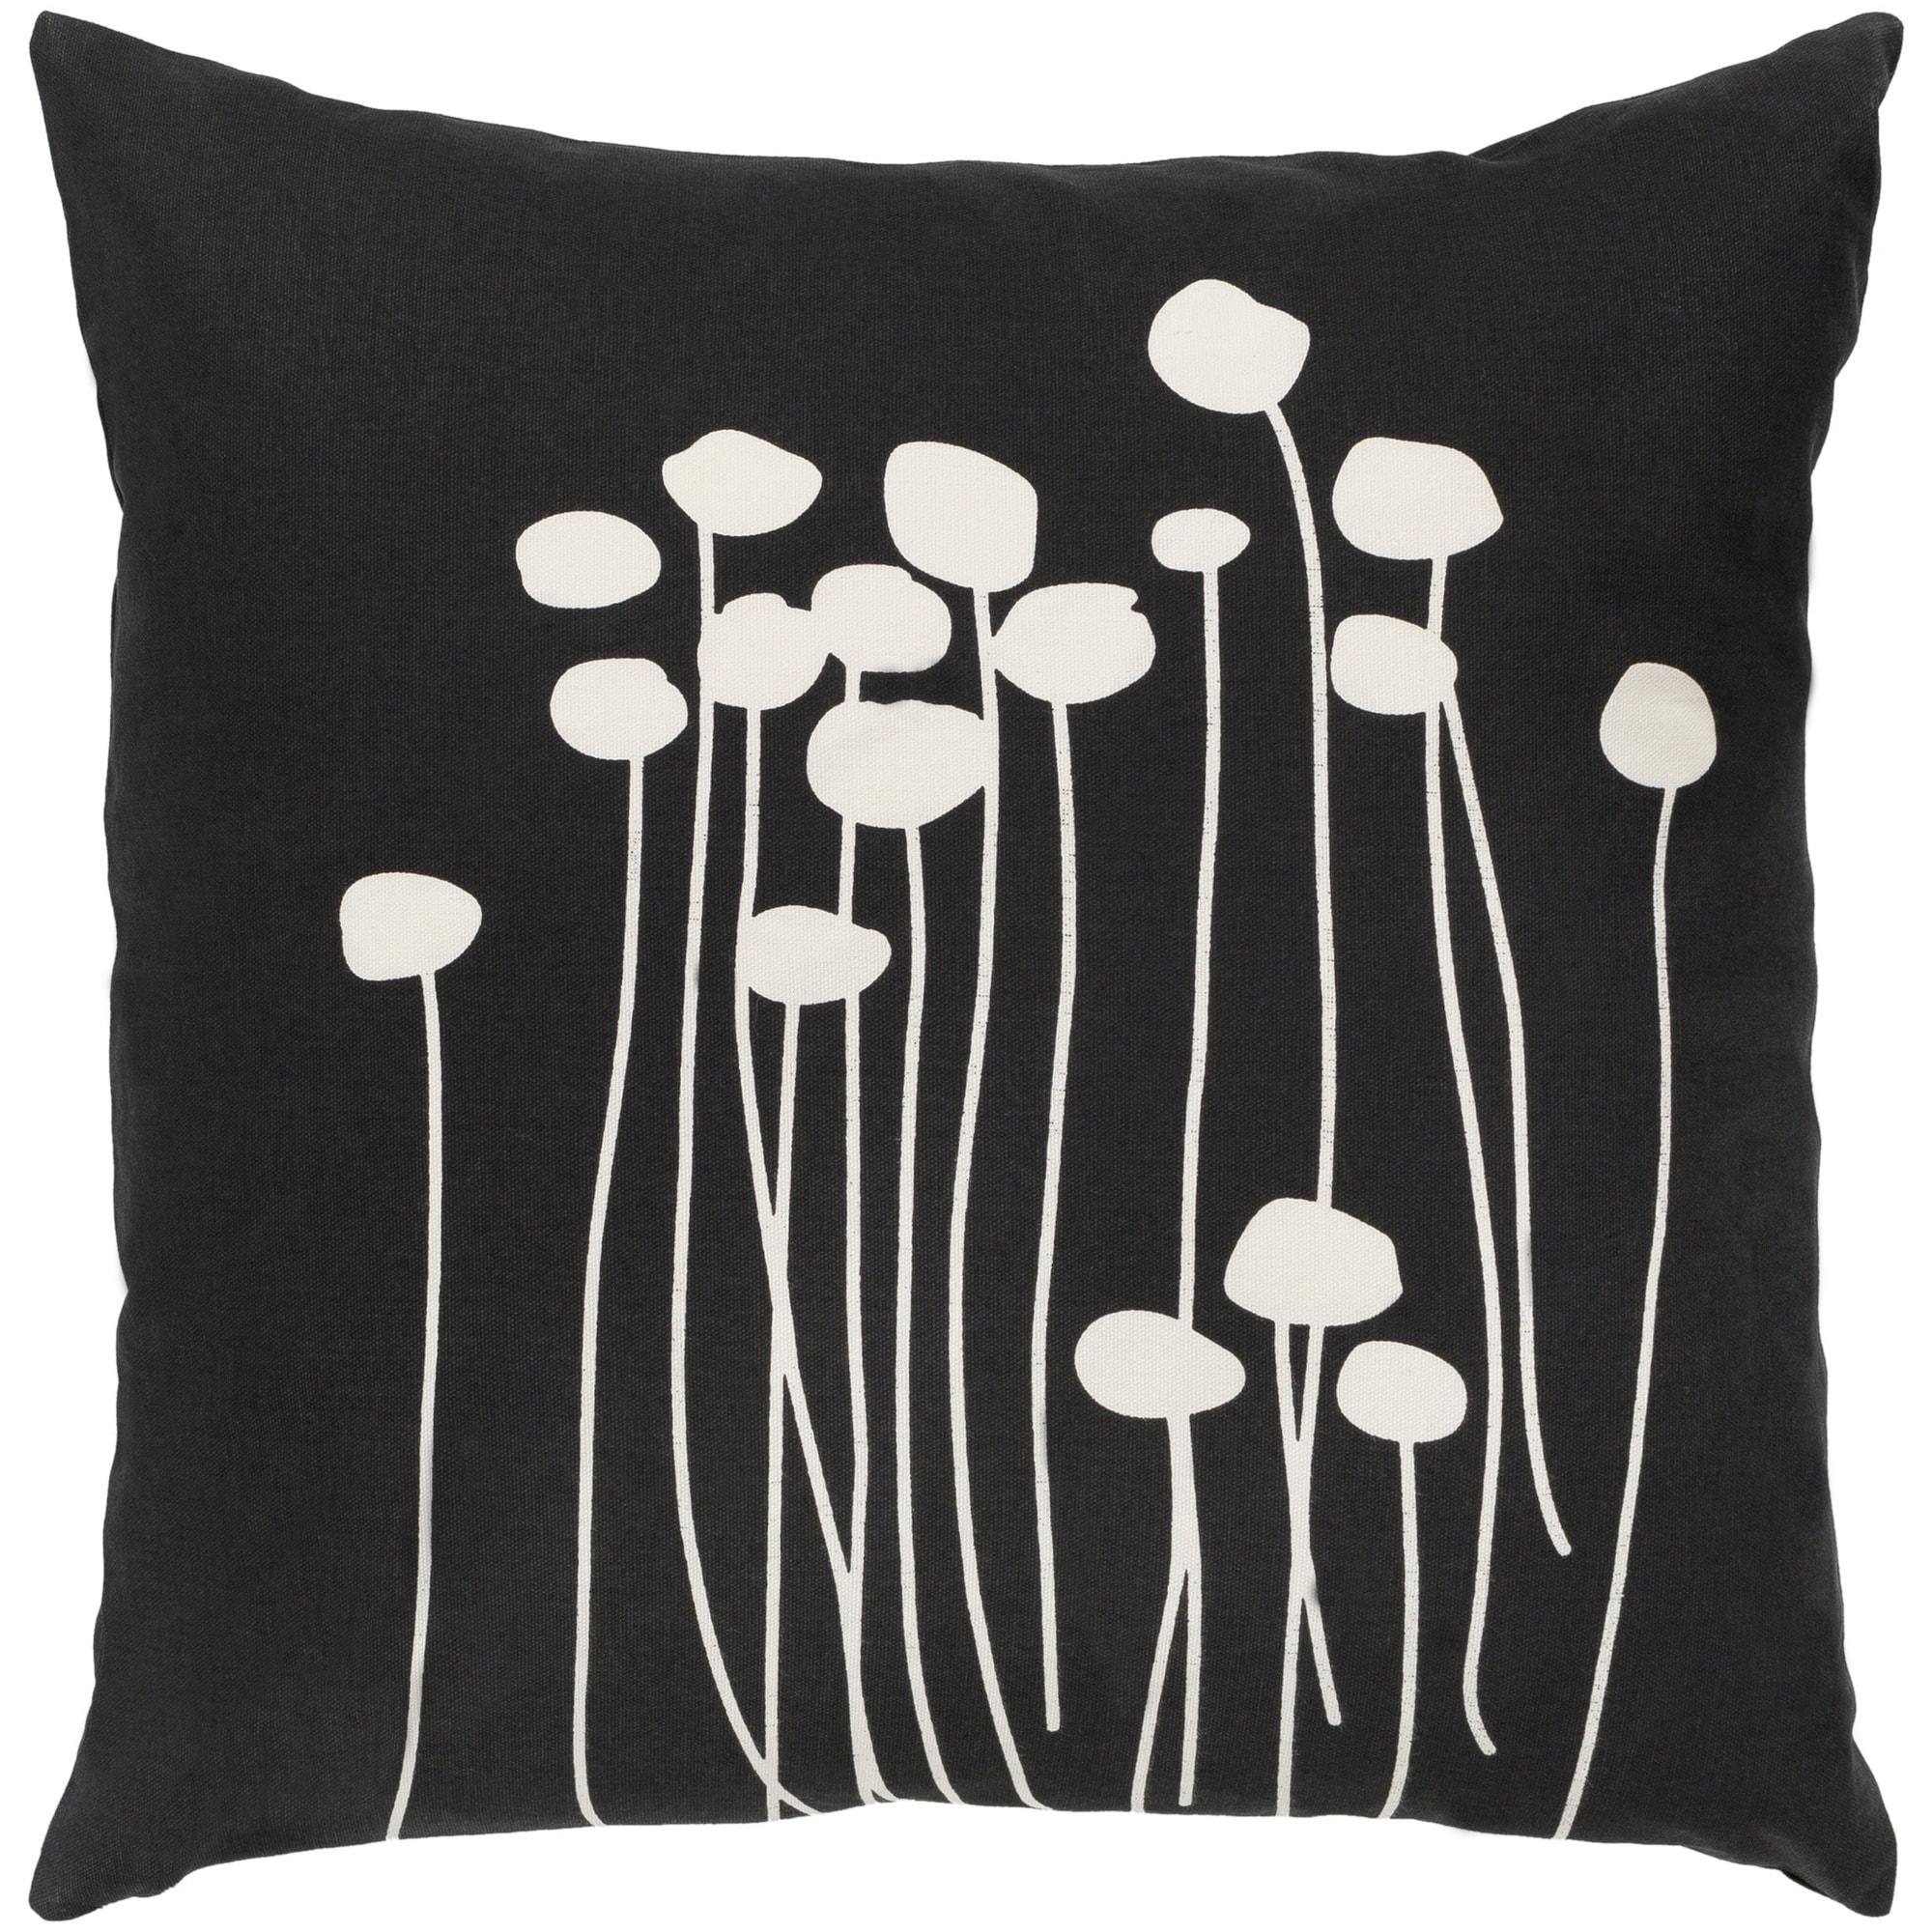 Shop Decorative Black Carlie Floral 22 Inch Throw Pillow Cover